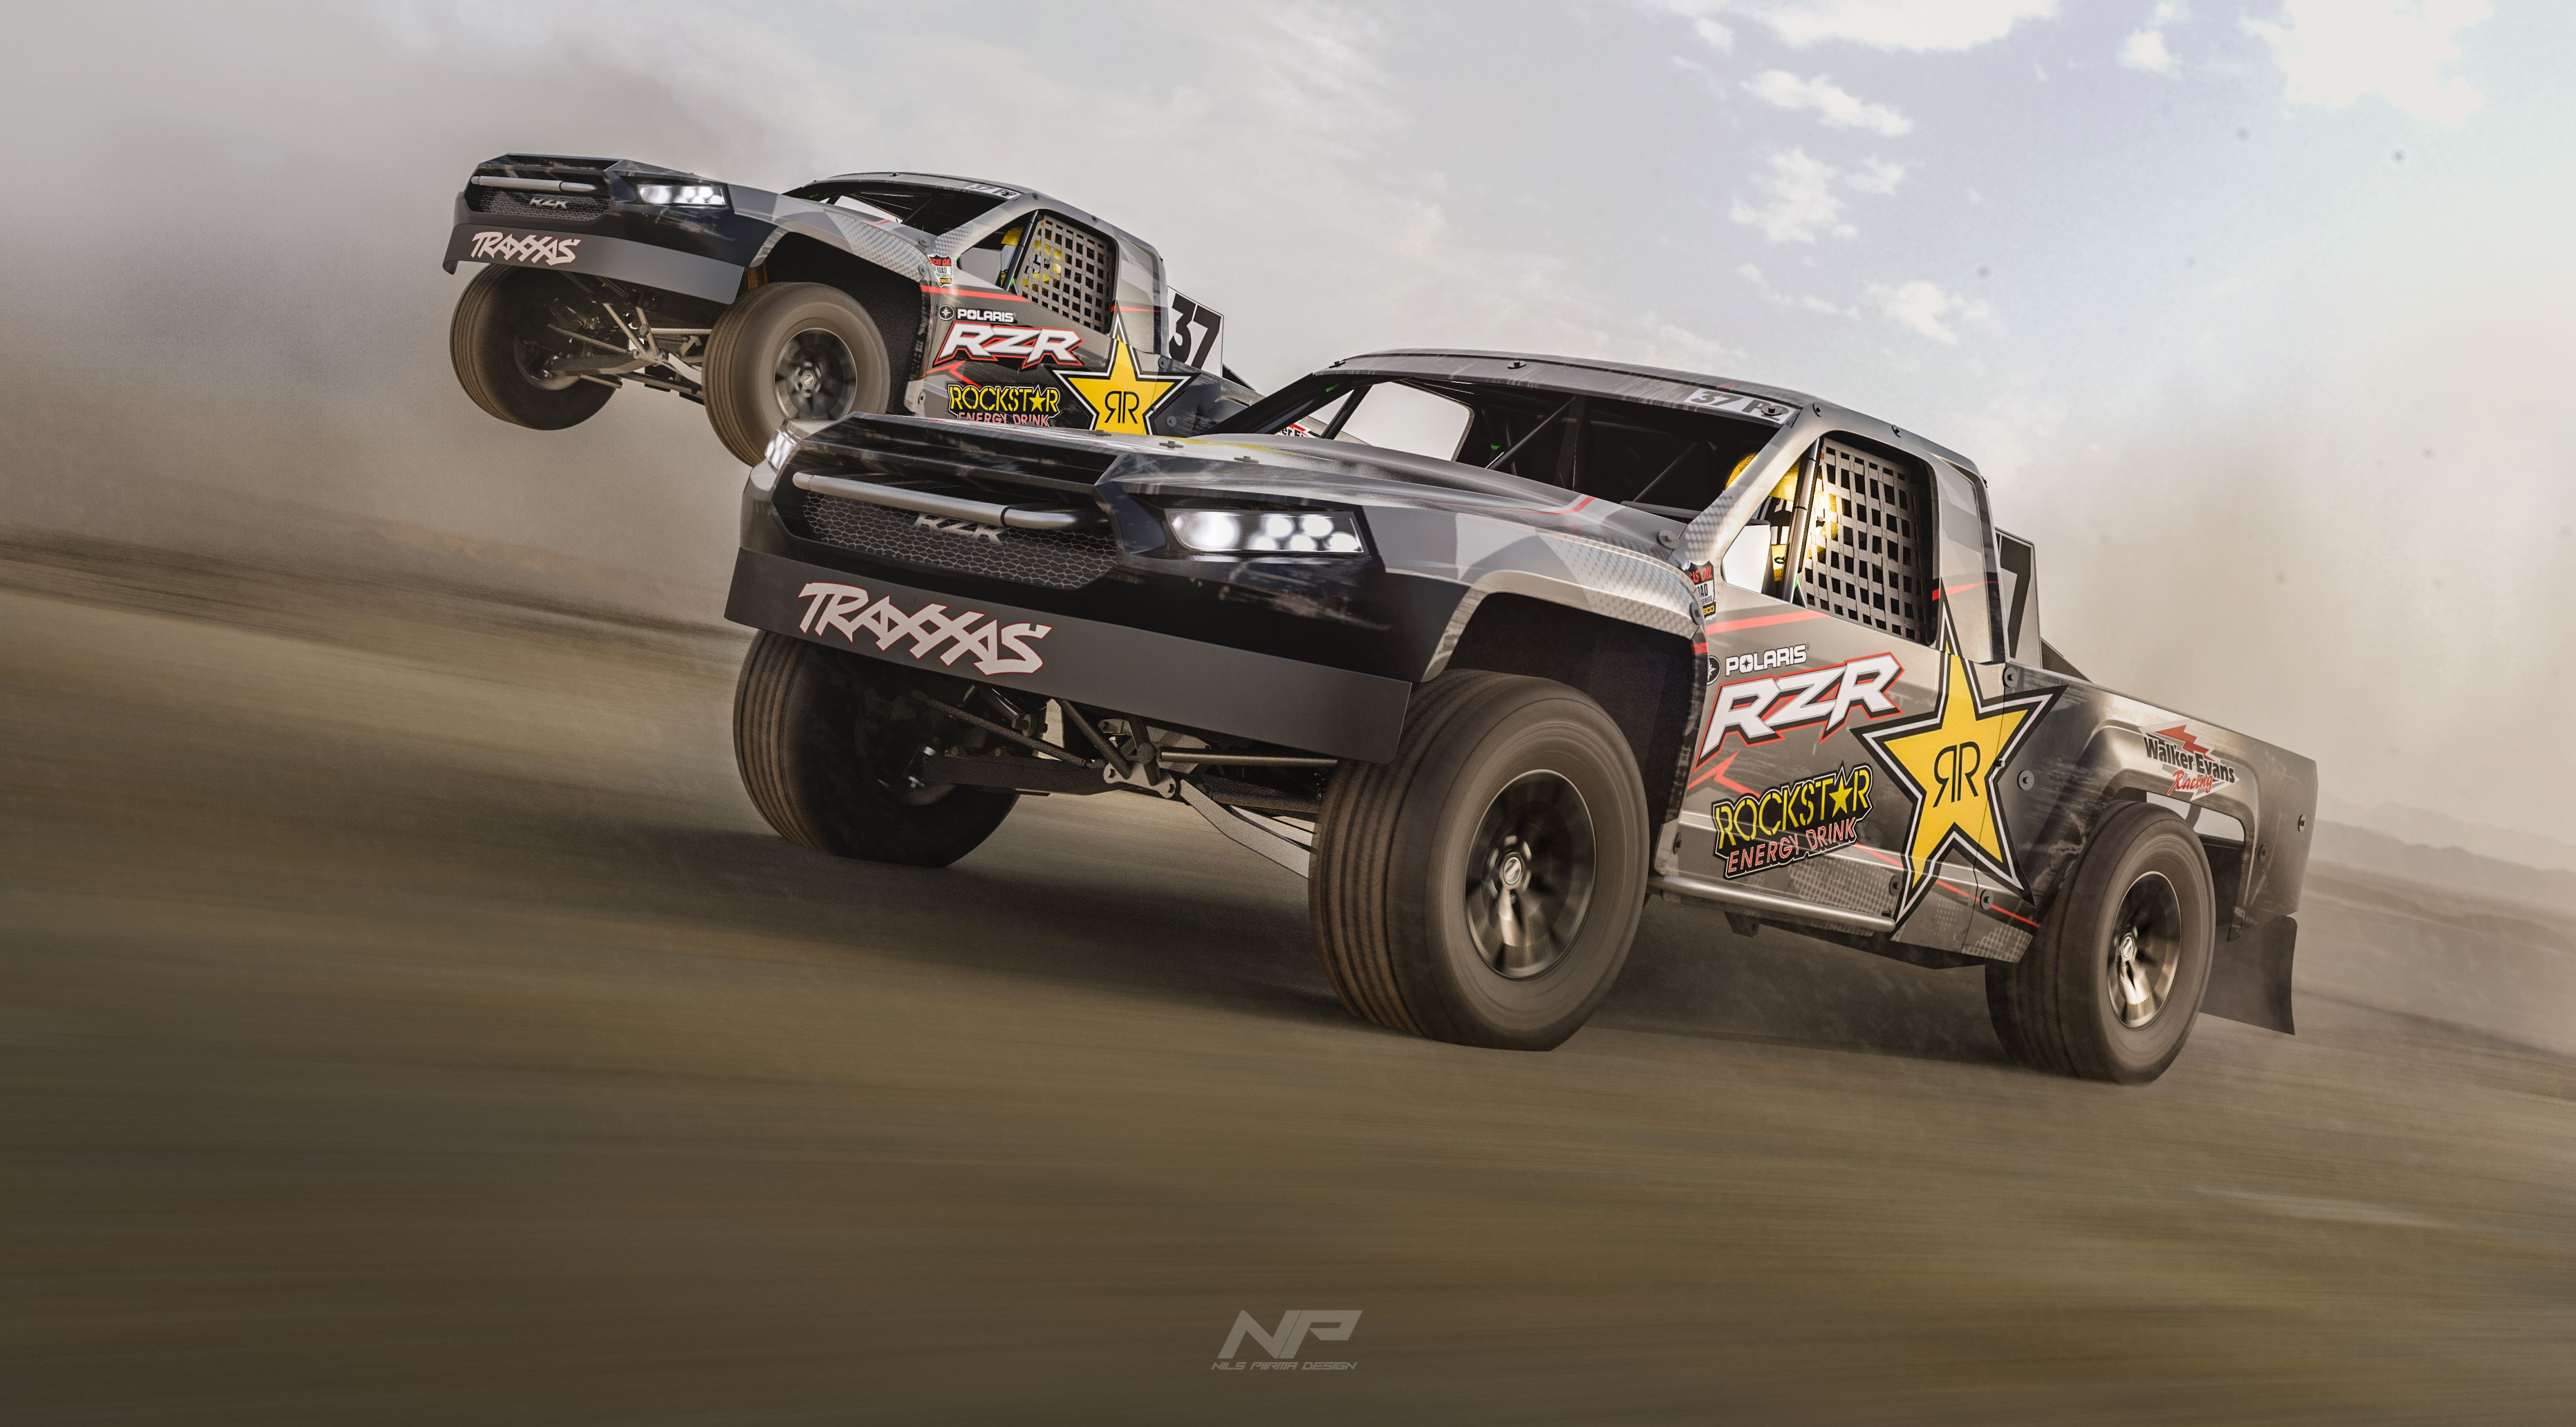 Image Result For Ford Trophy Truck Wallpaper Monster Trucks Trophy Truck Trucks